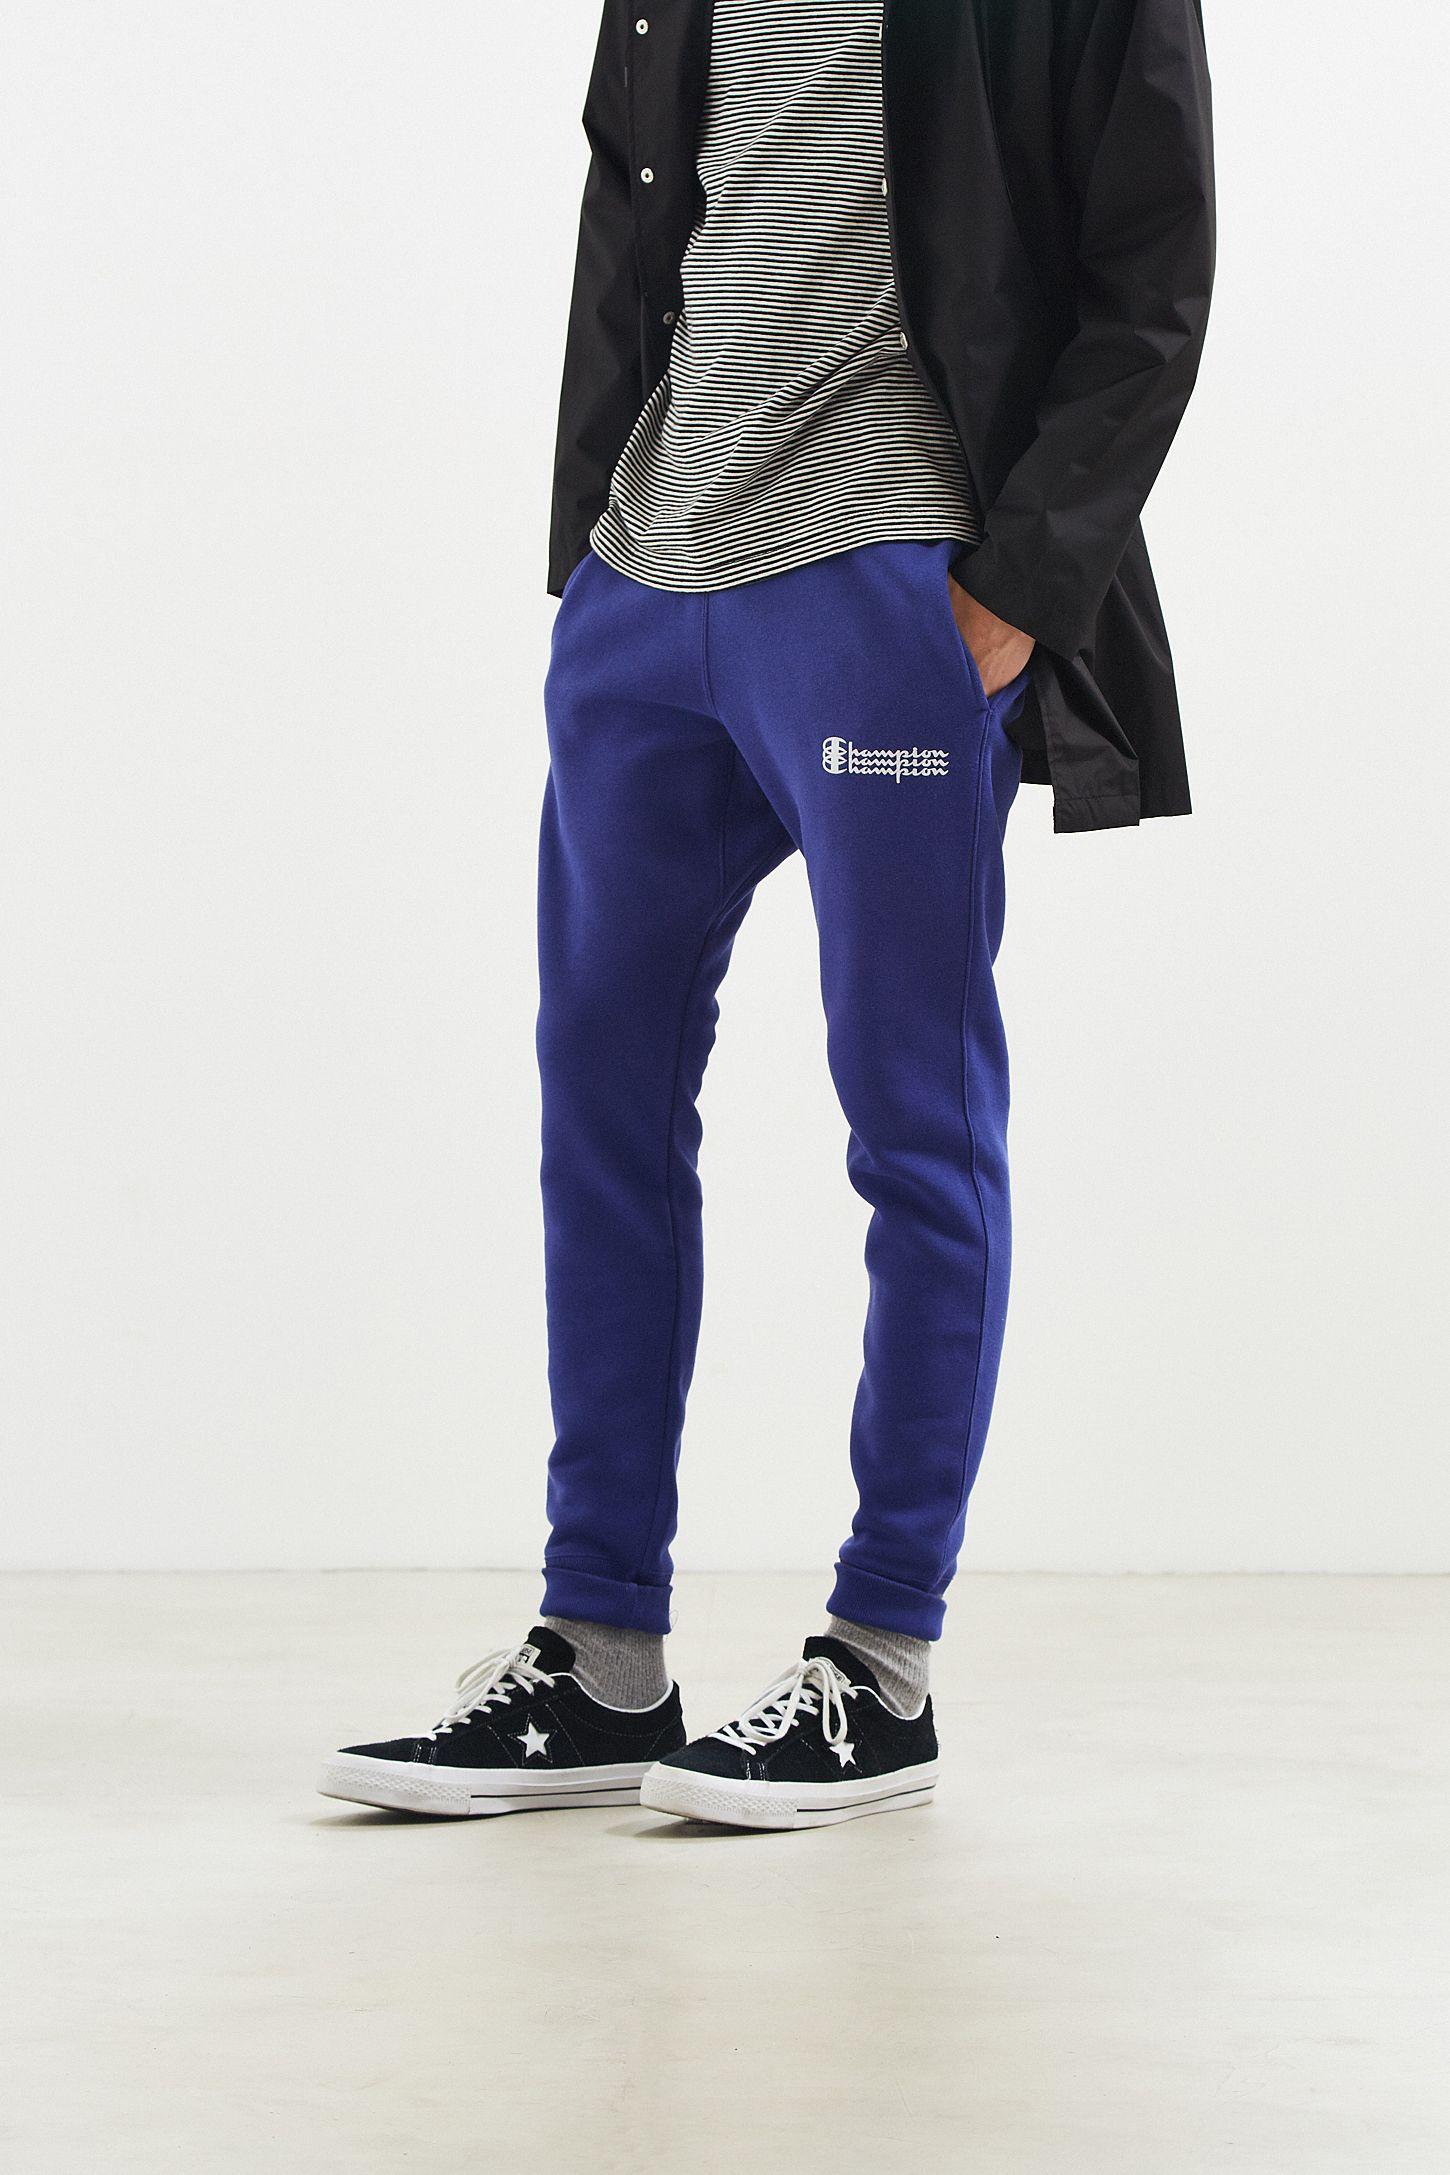 495e3b6e28bb Champion   UO Reverse Weave Fleece Triple Script Jogger Pant